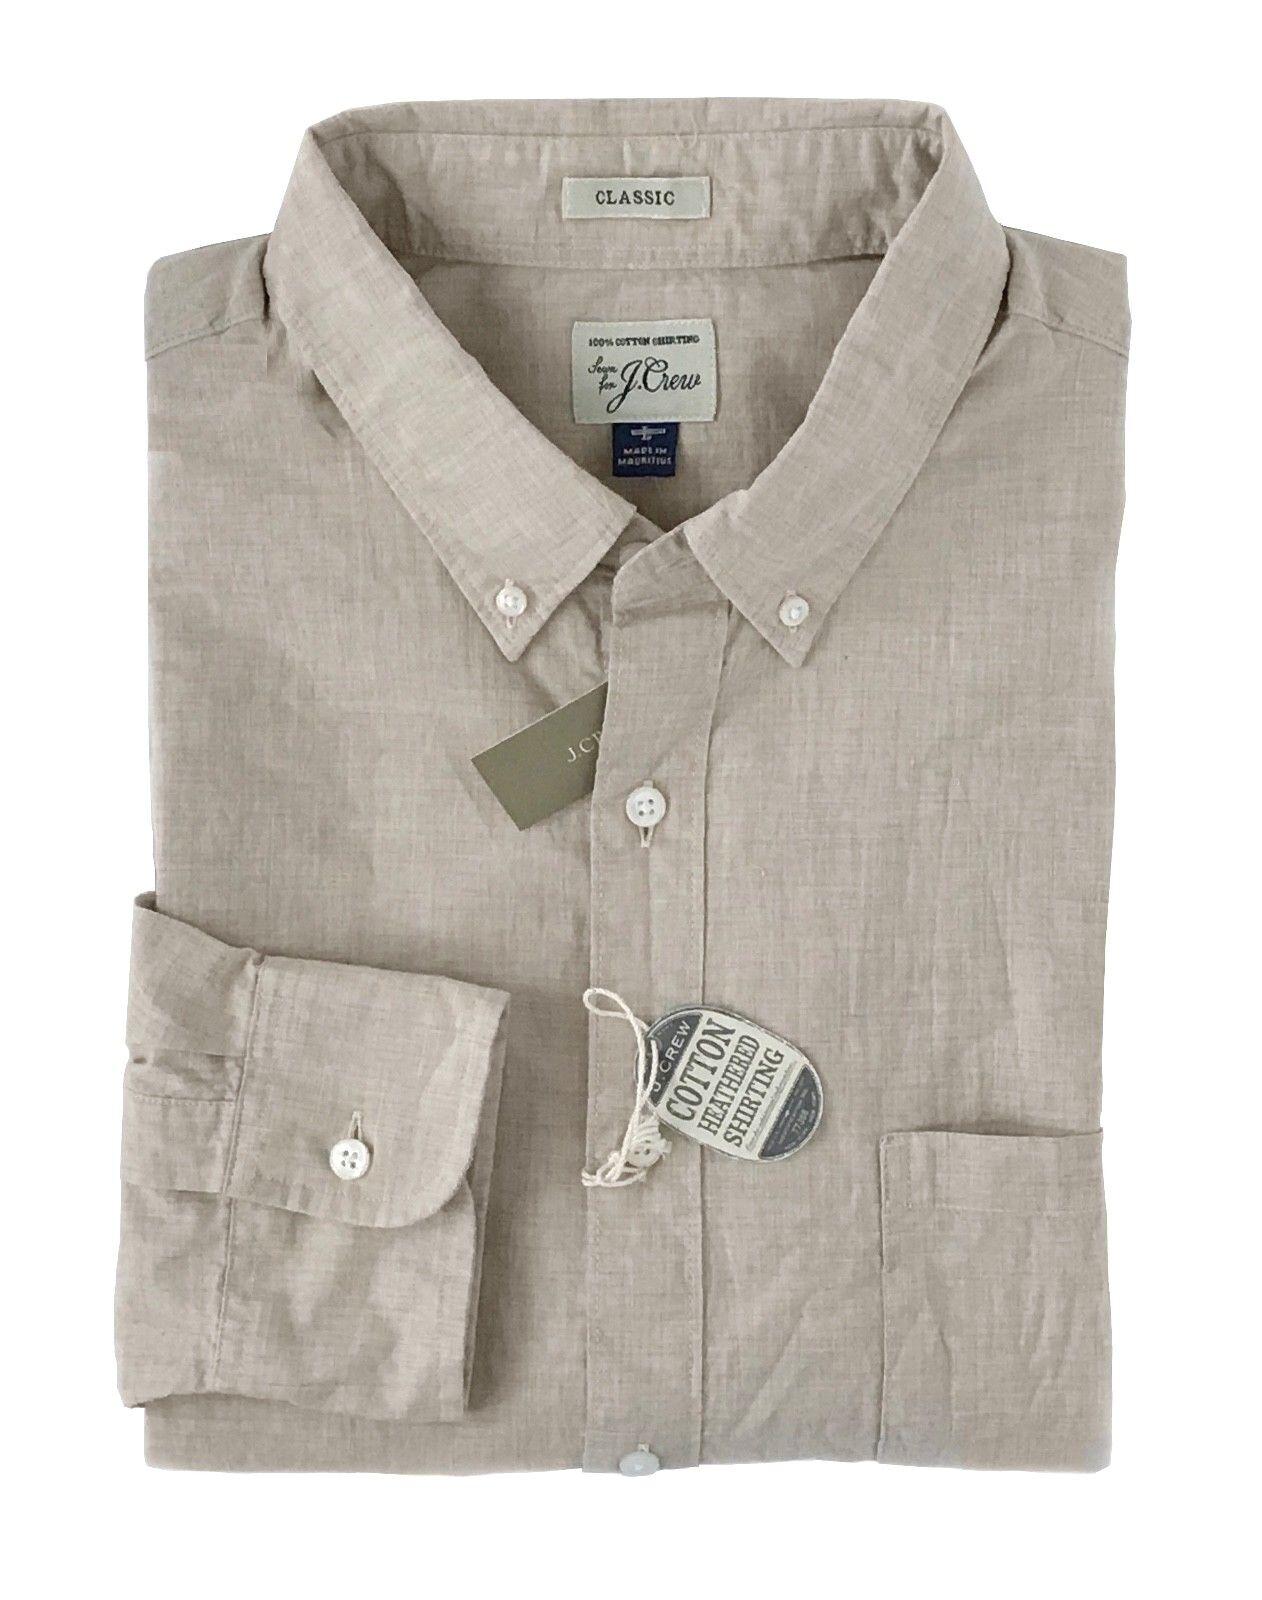 J Crew - Mens L - Classic Fit - Sand Stone Khaki Heathered Cotton Shirt